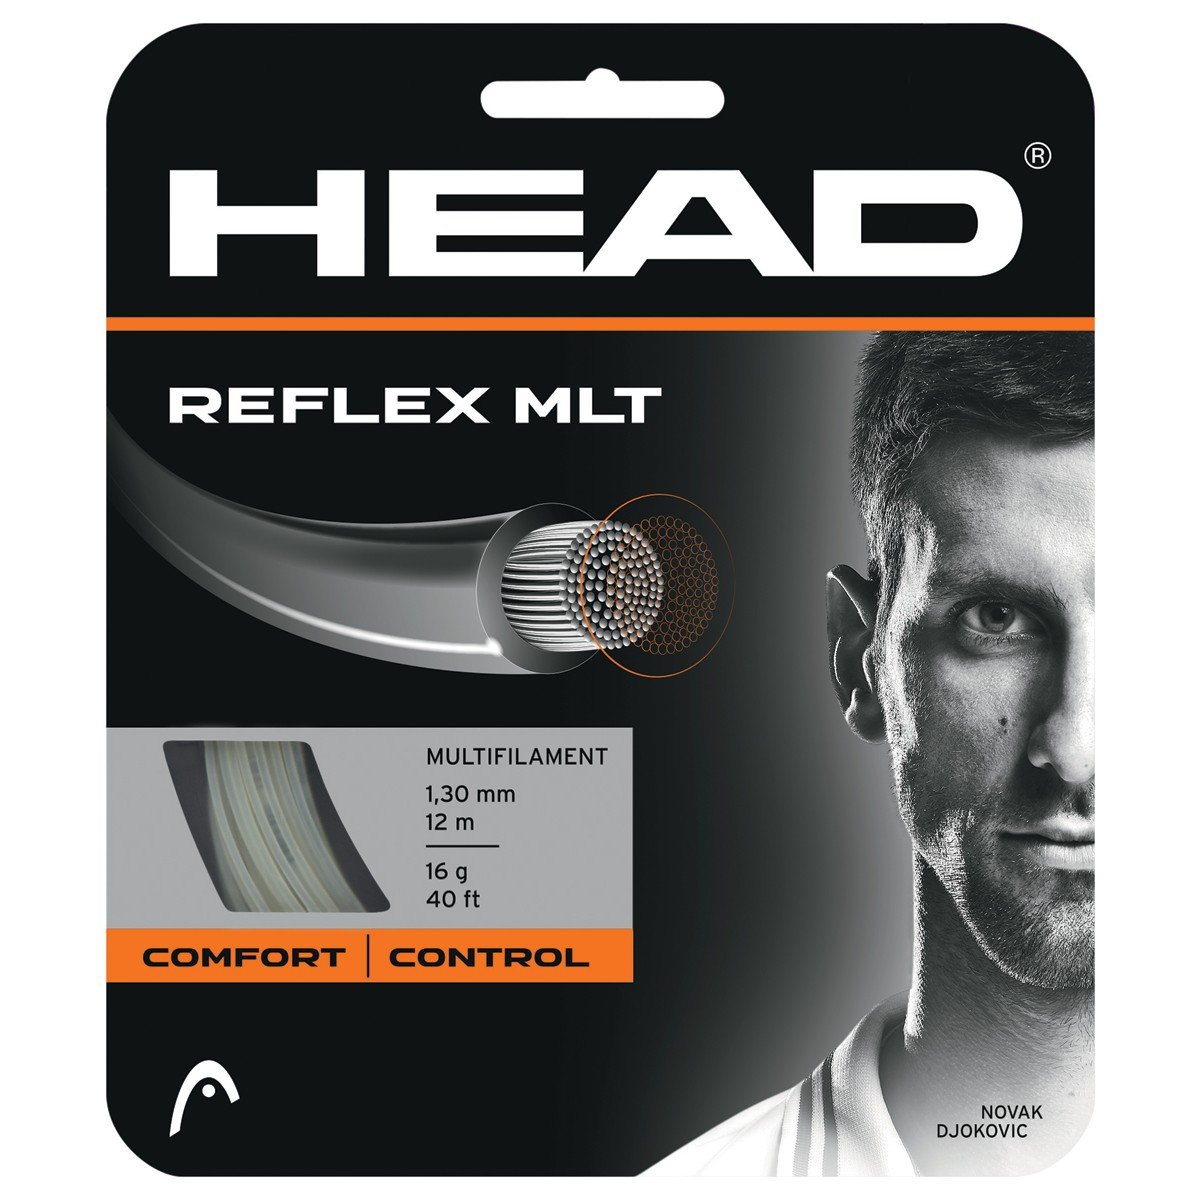 CORDAGE HEAD REFLEX MLT (12 METRES)